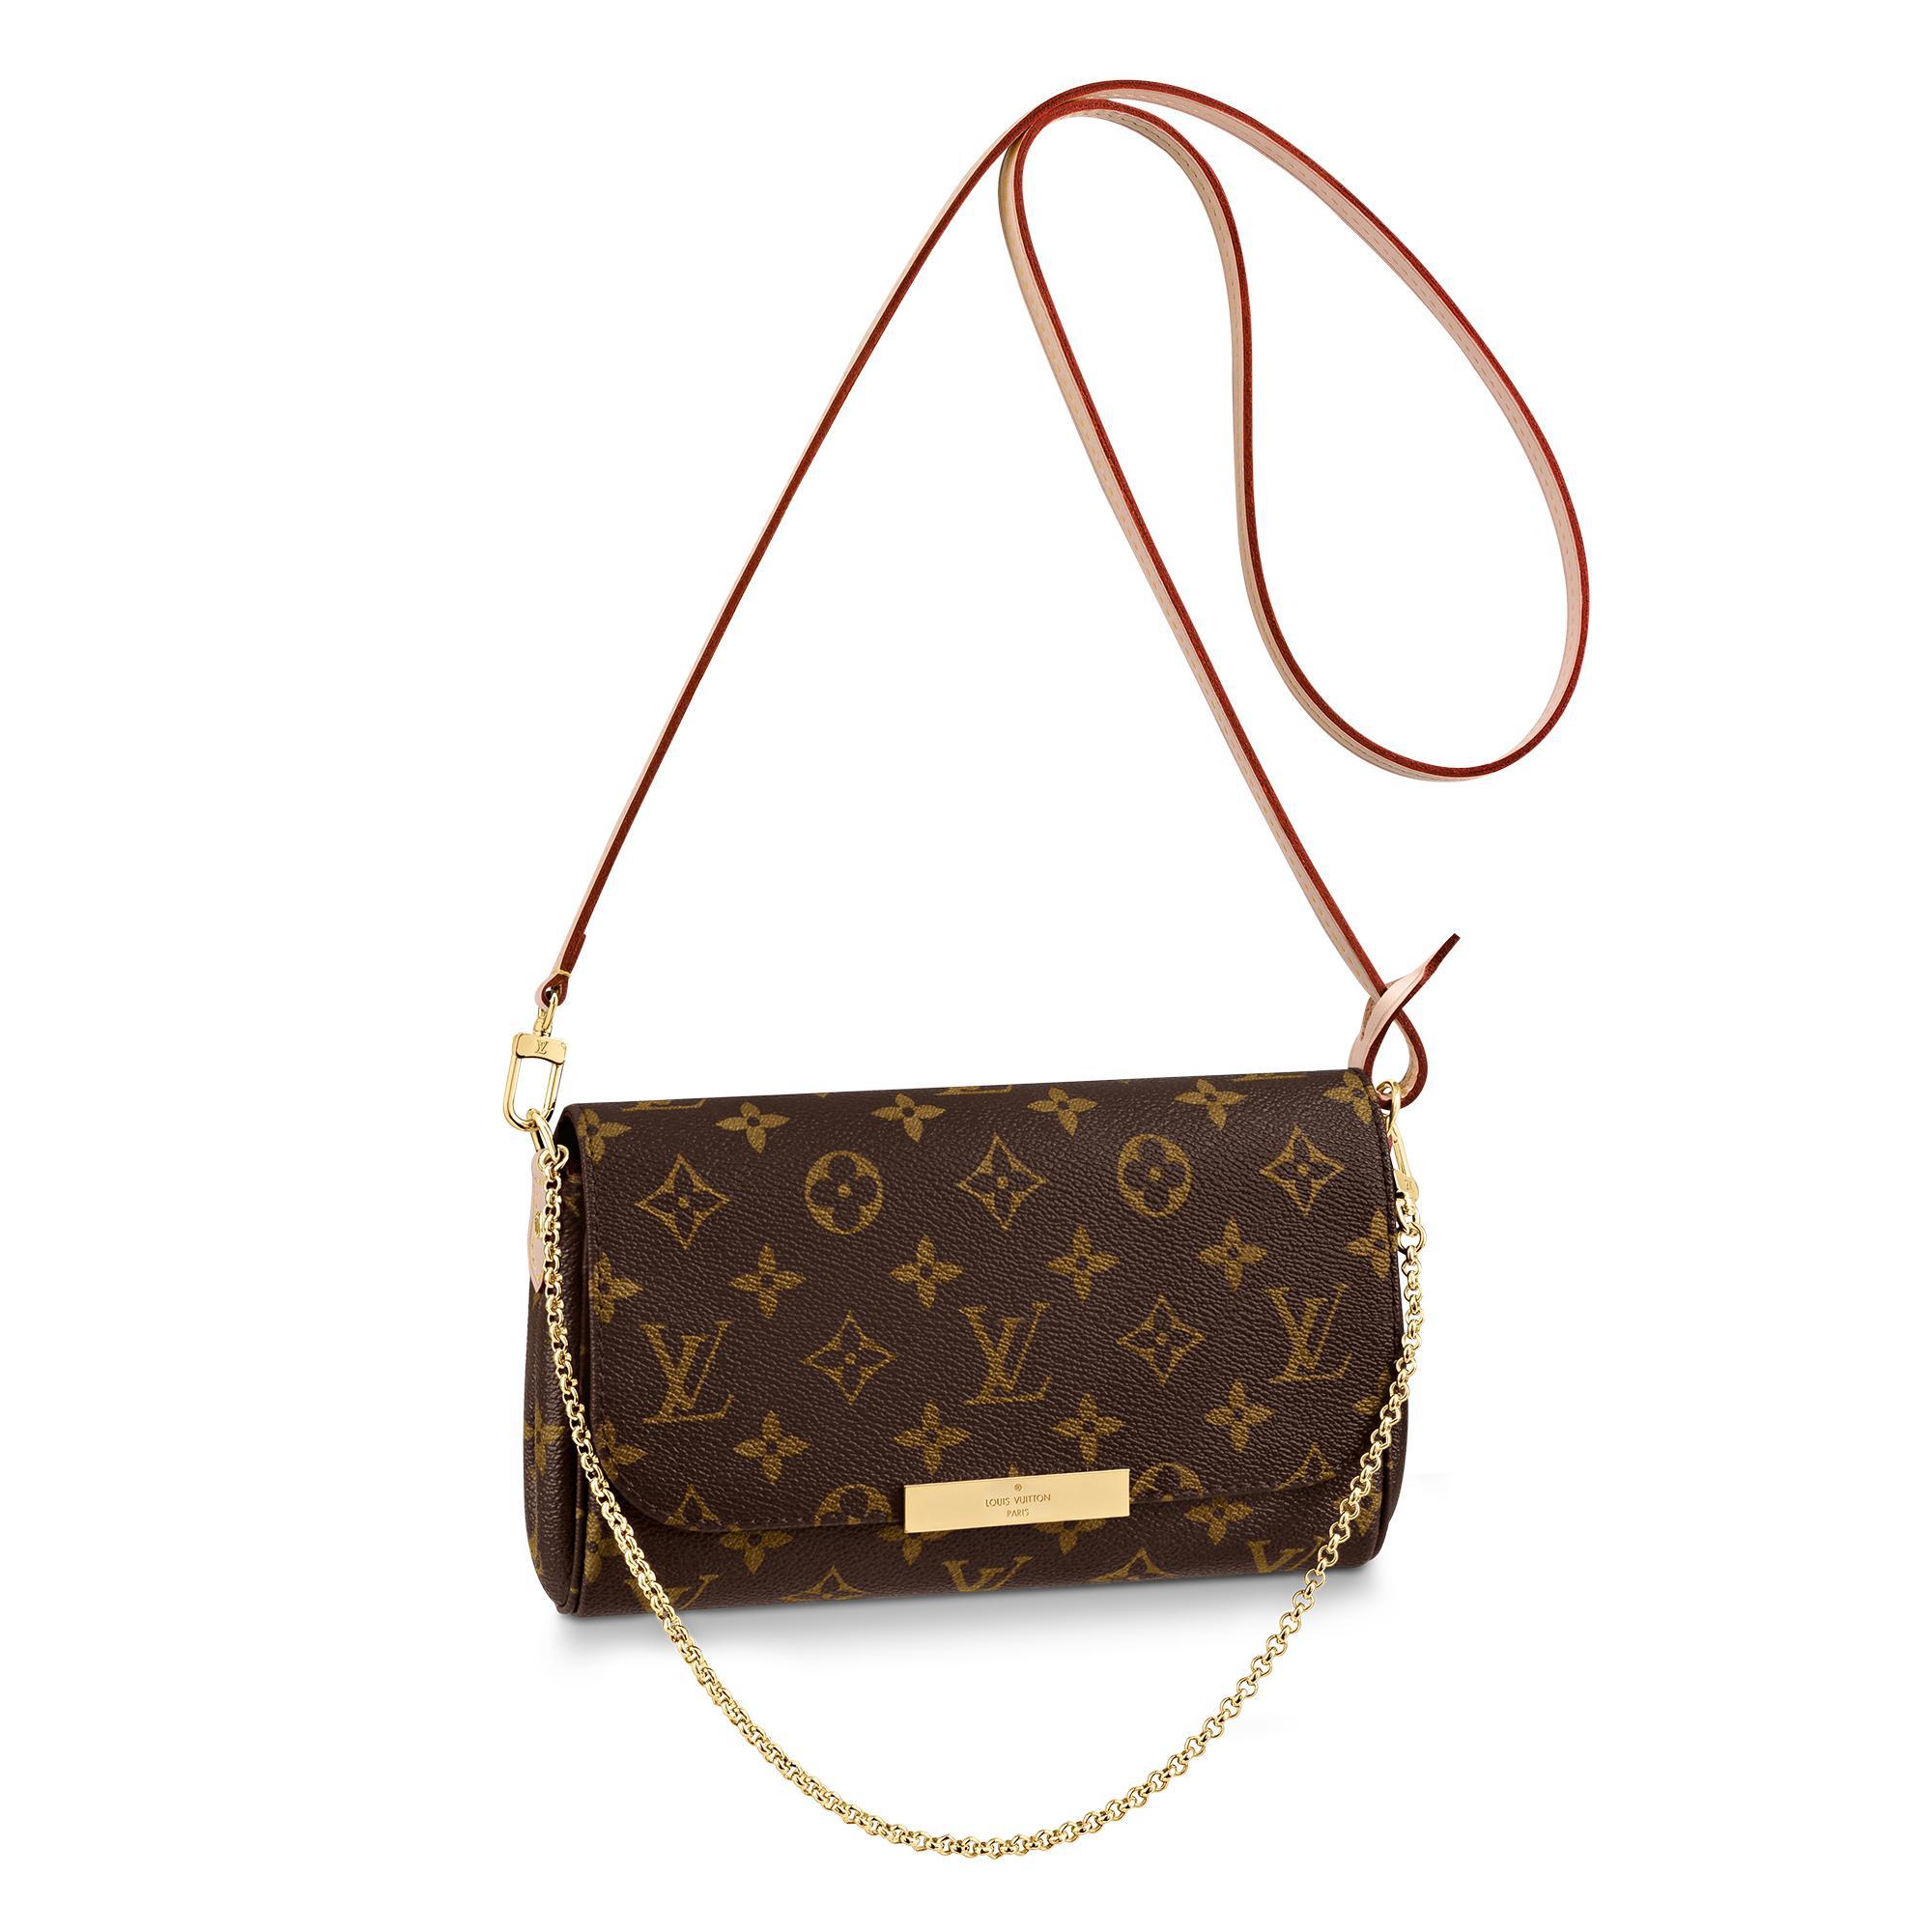 Louis Vuitton Favorite Pm In Monogram